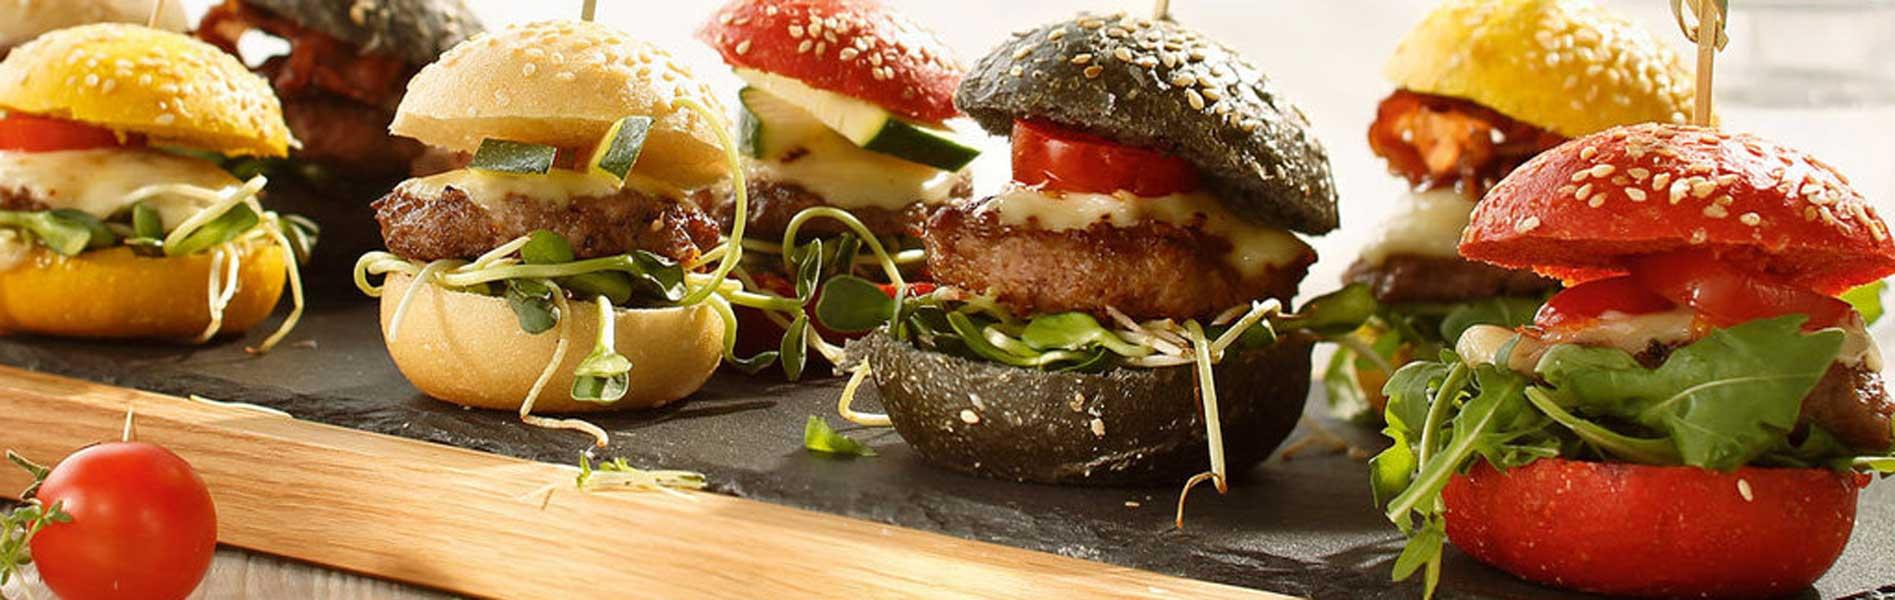 Unikorn Catering & Events-Street Food - München